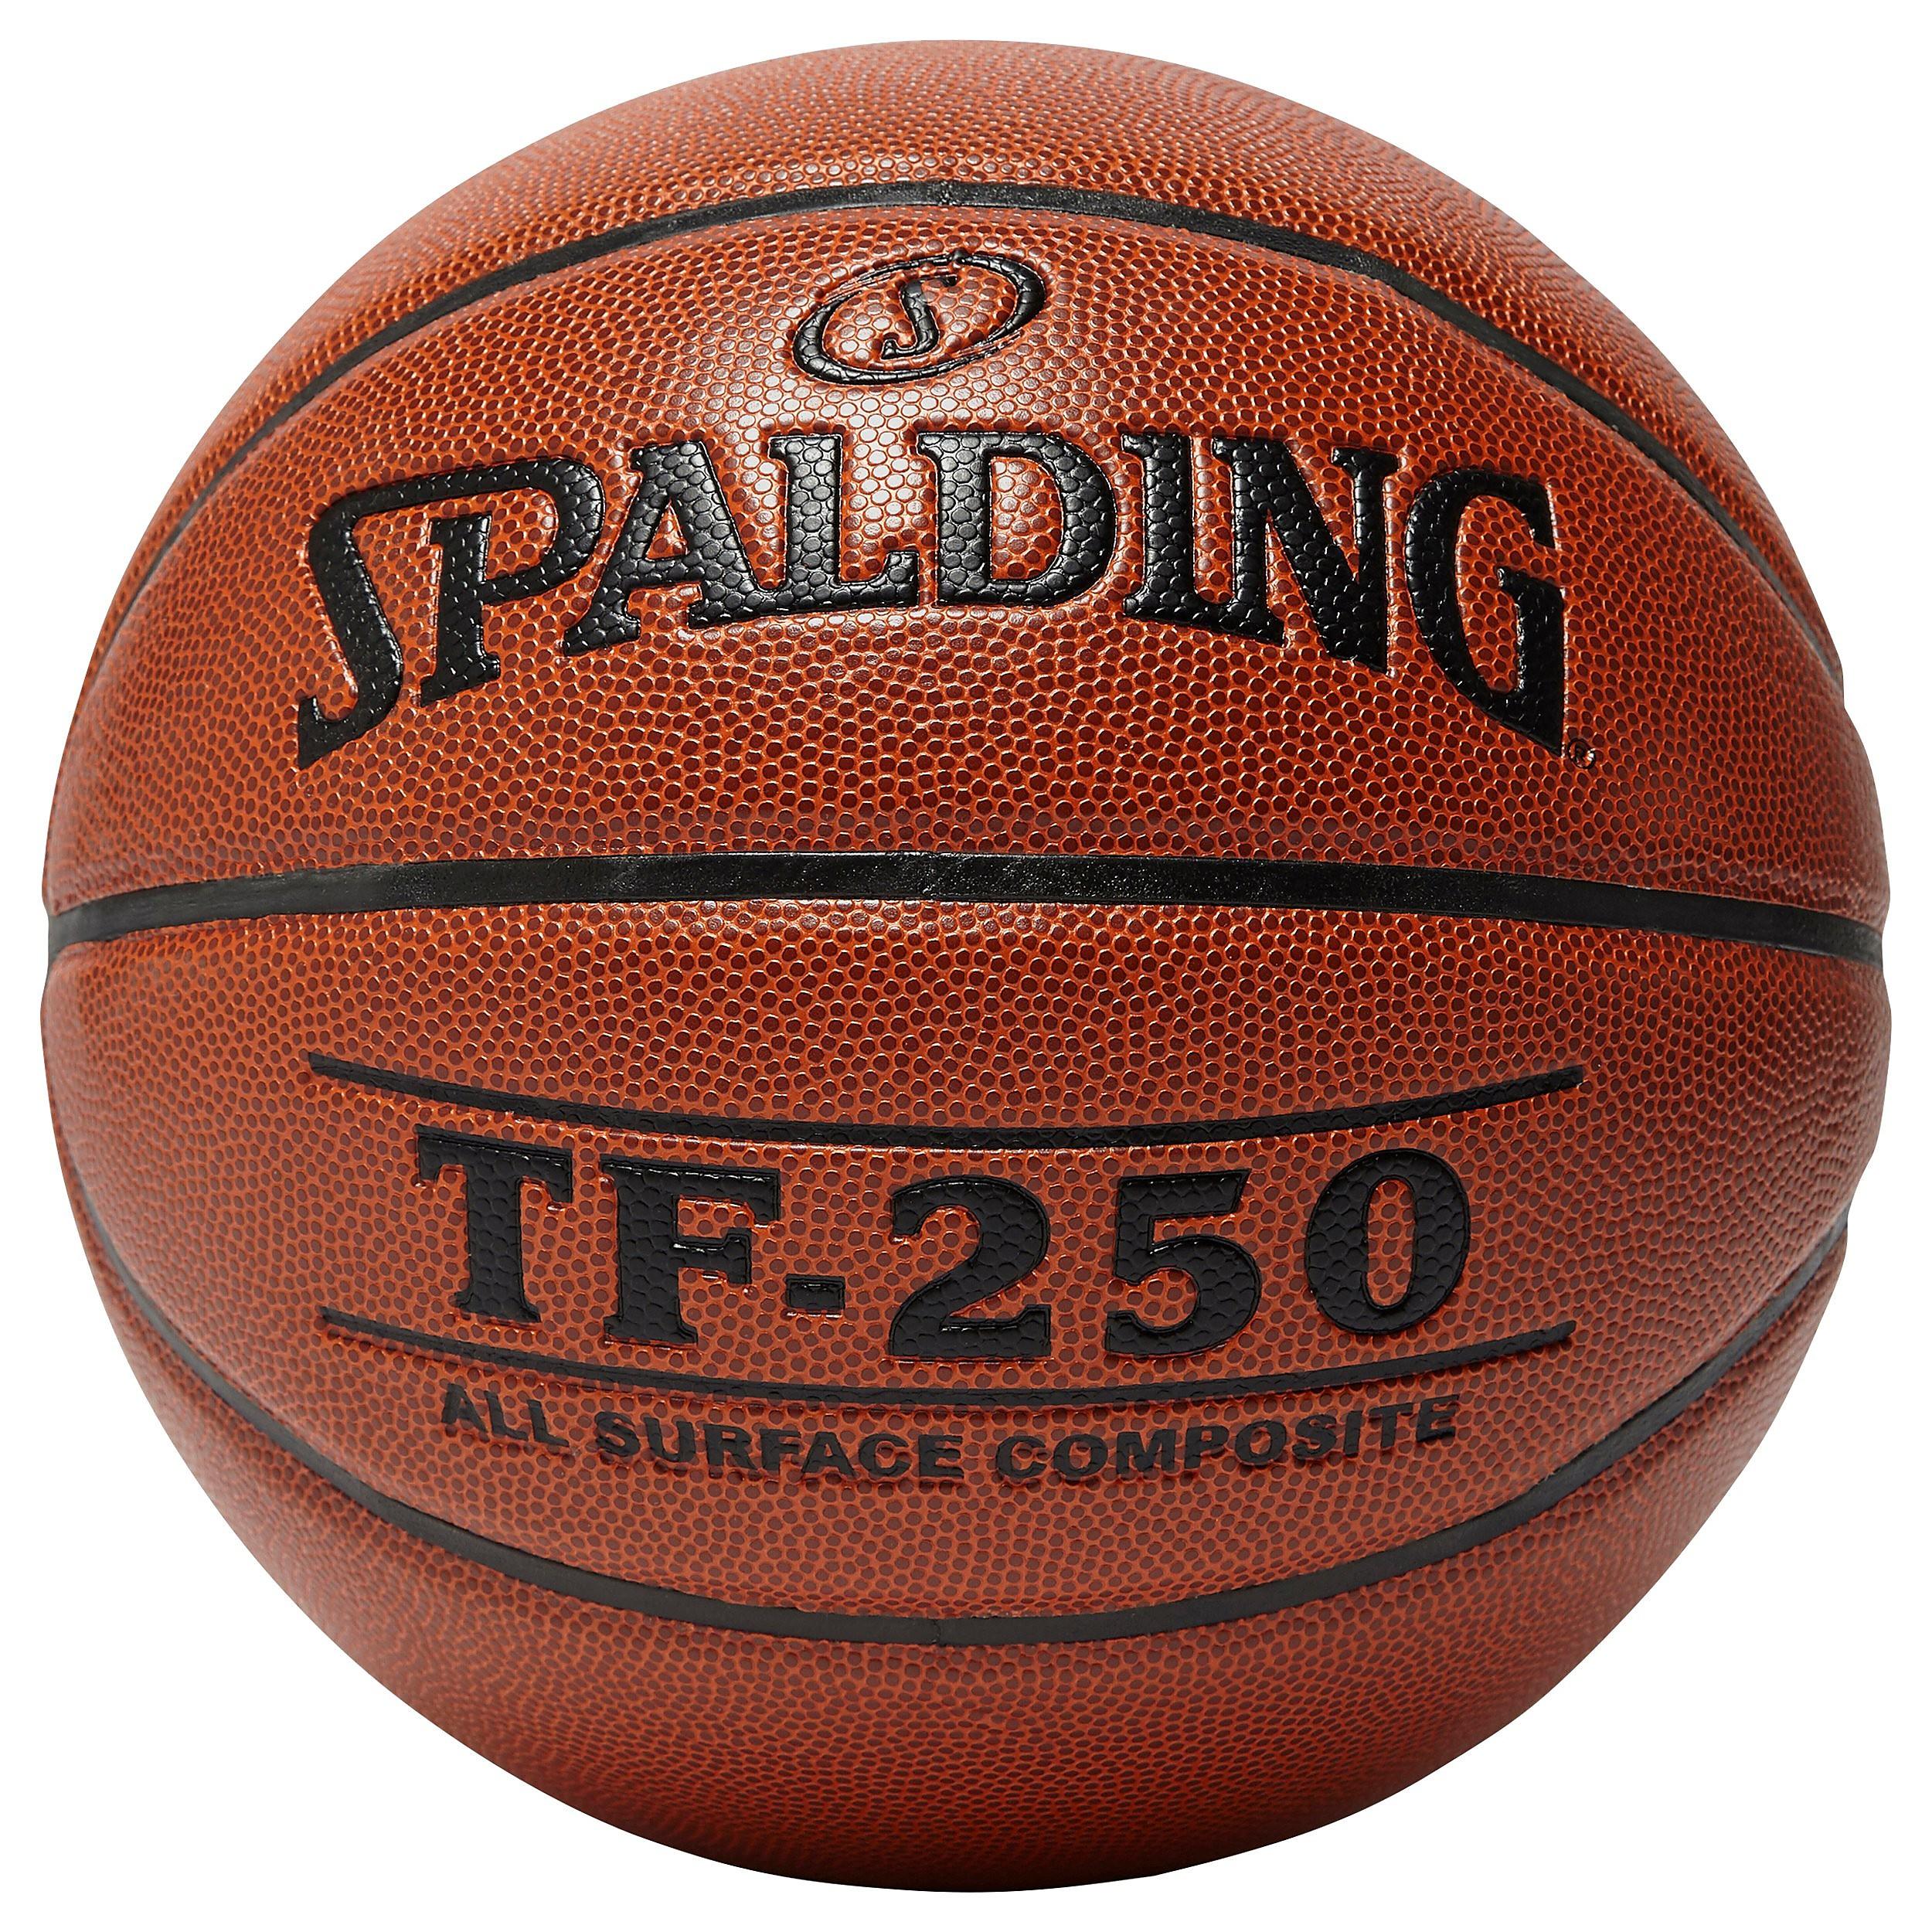 Spalding TF 250 Basketball